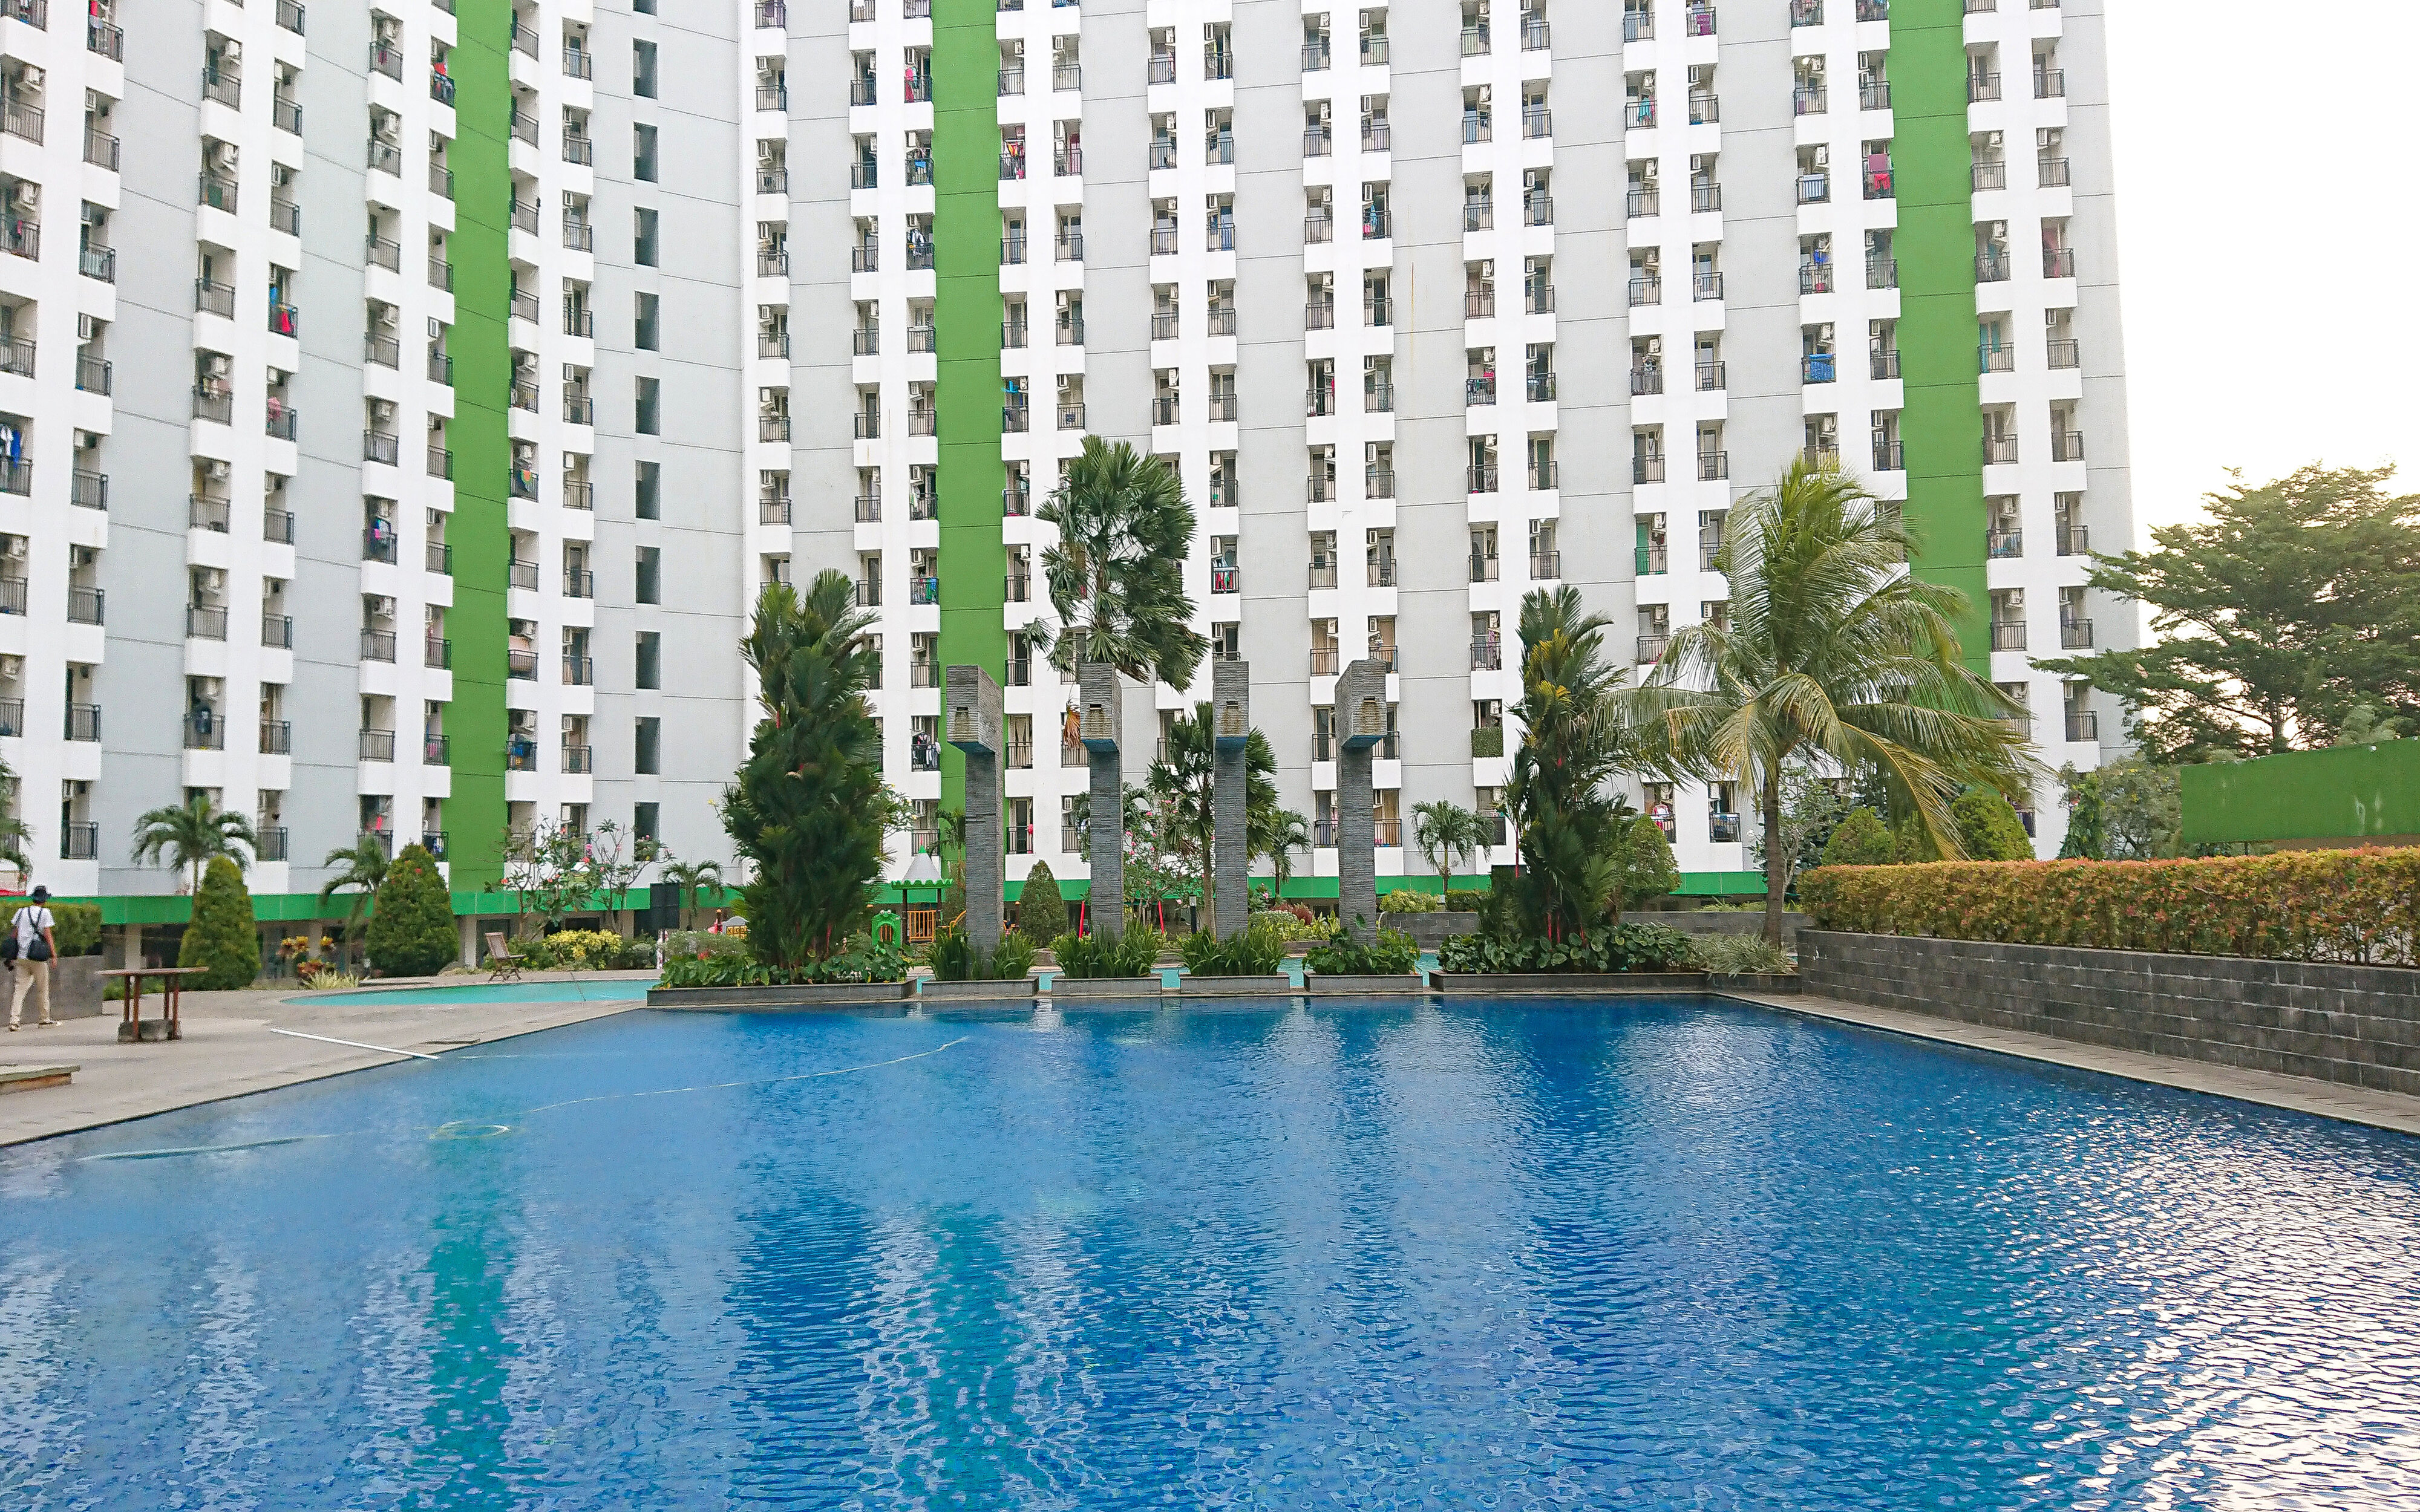 Istana Room Properti Green Lake View, Tangerang Selatan